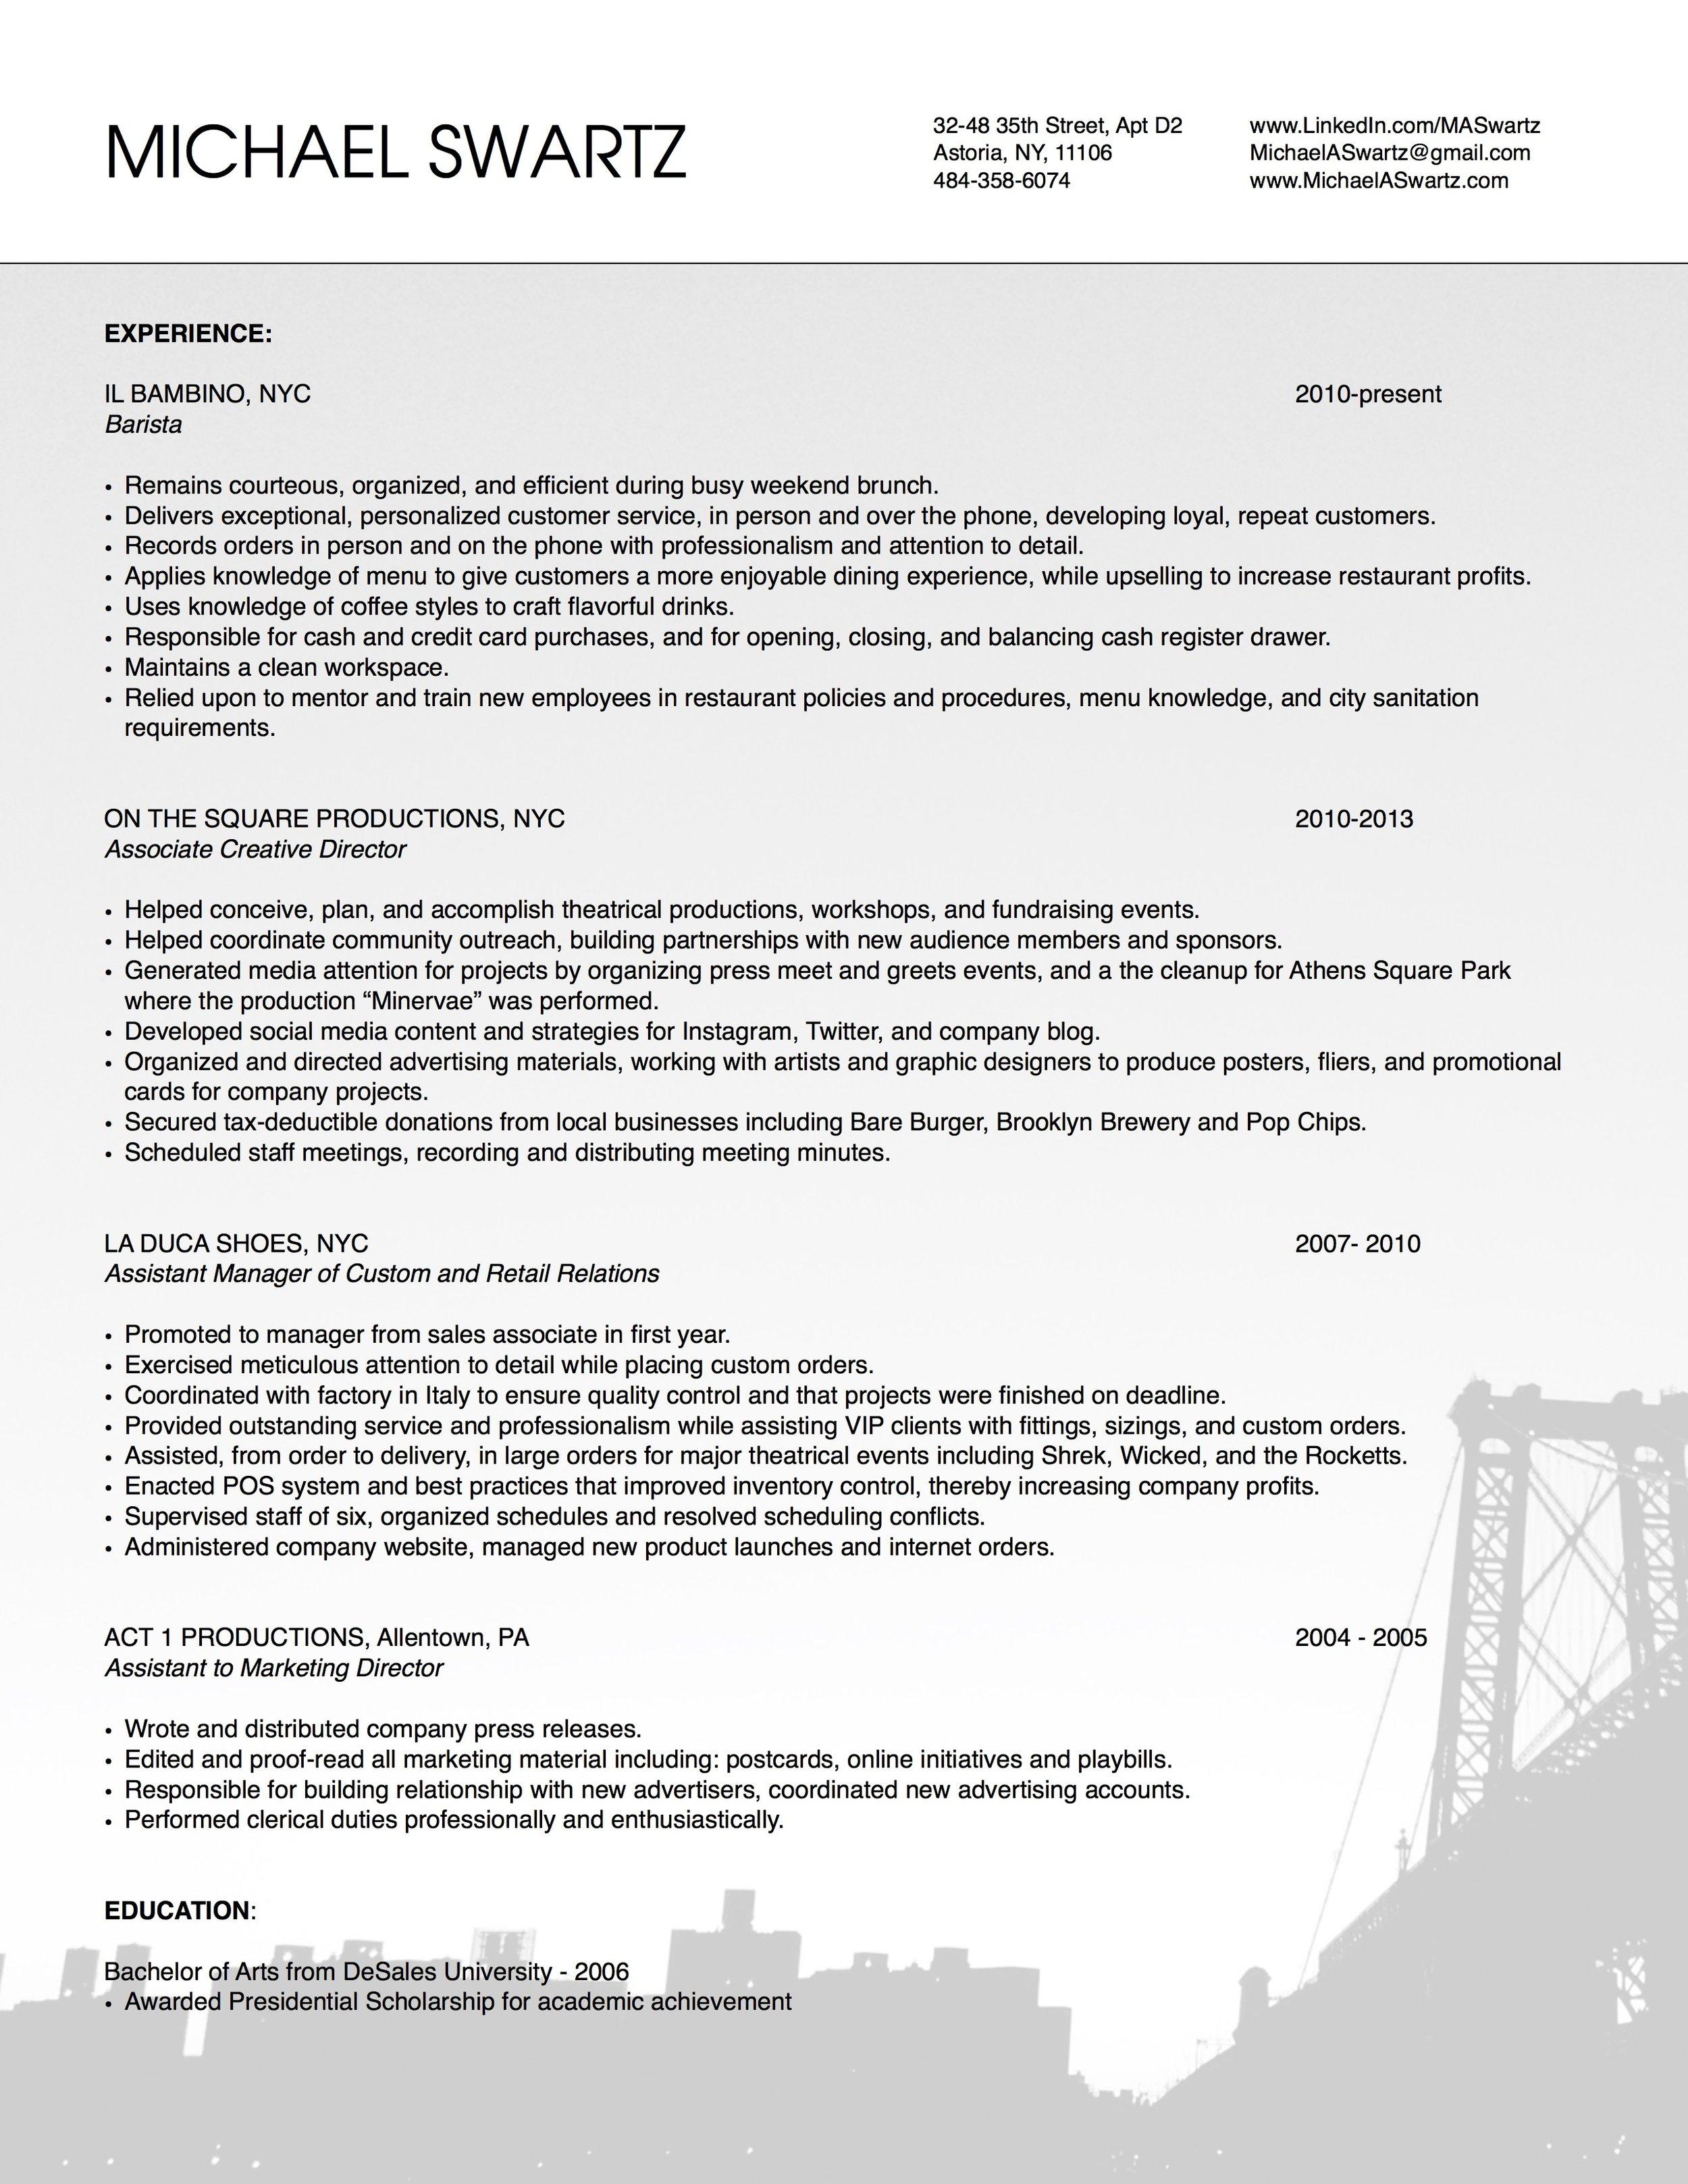 SWARTZ RESUME 8-13-15.jpg